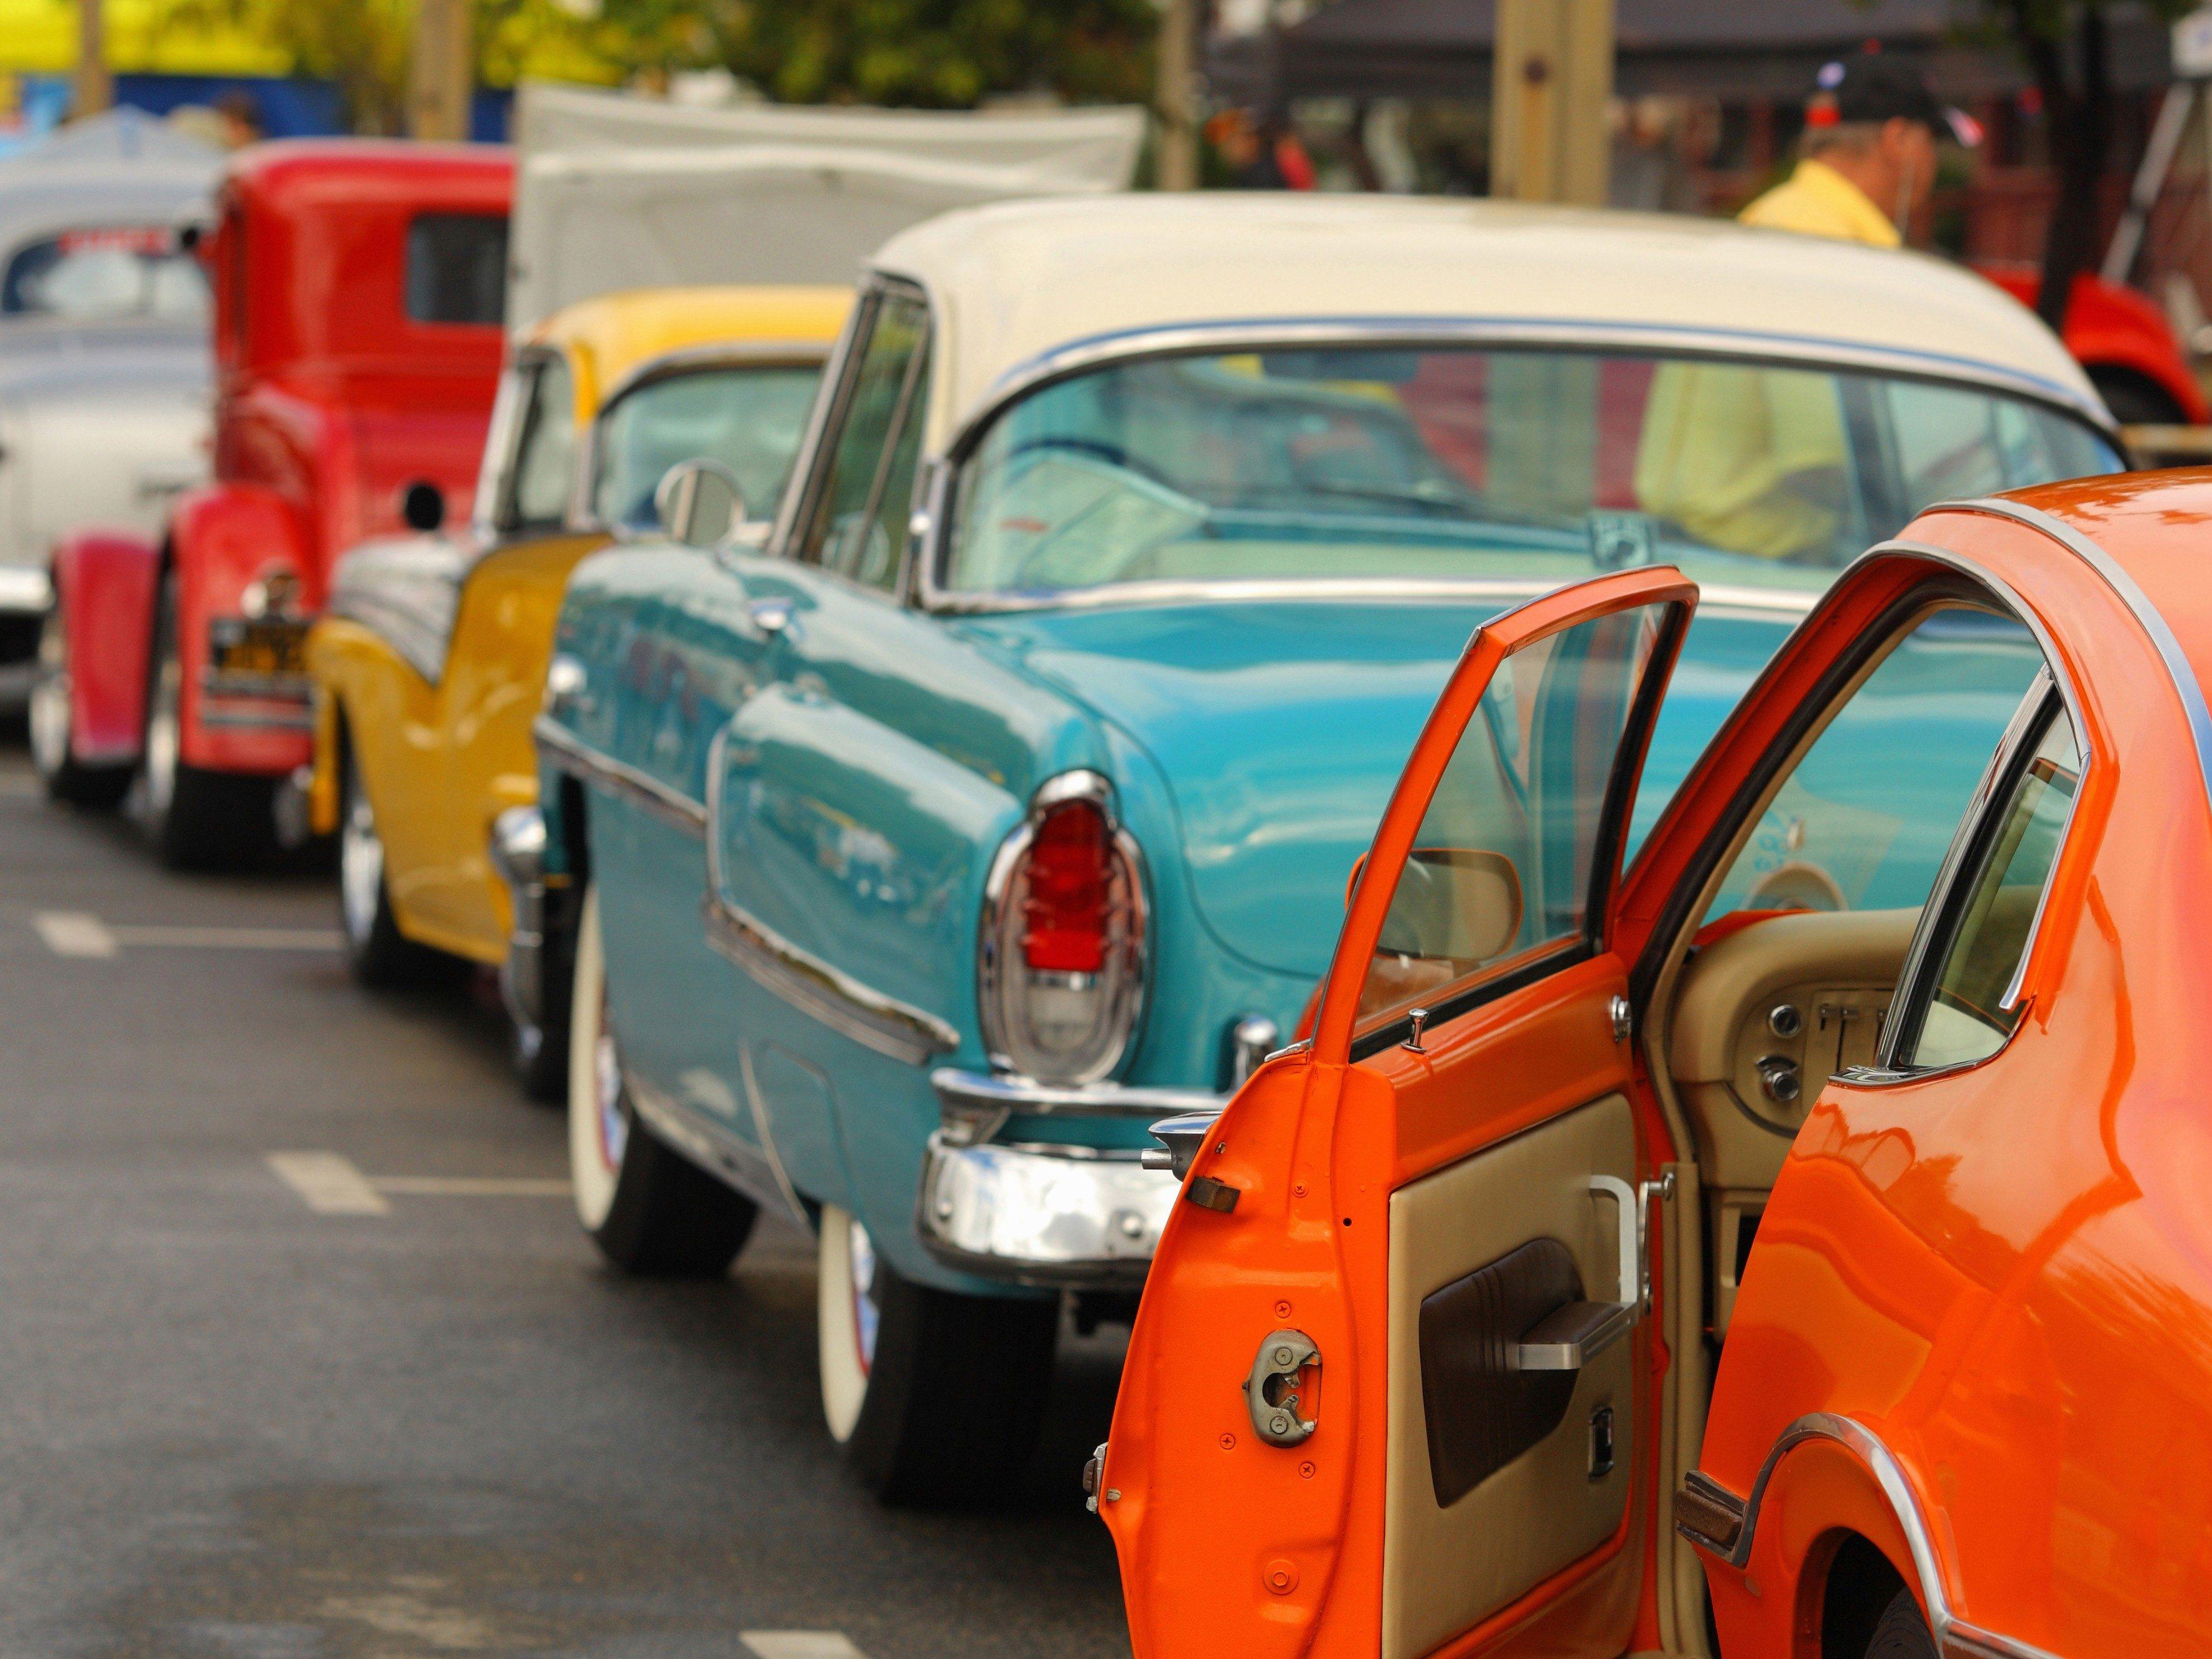 Where to find classic car accessories